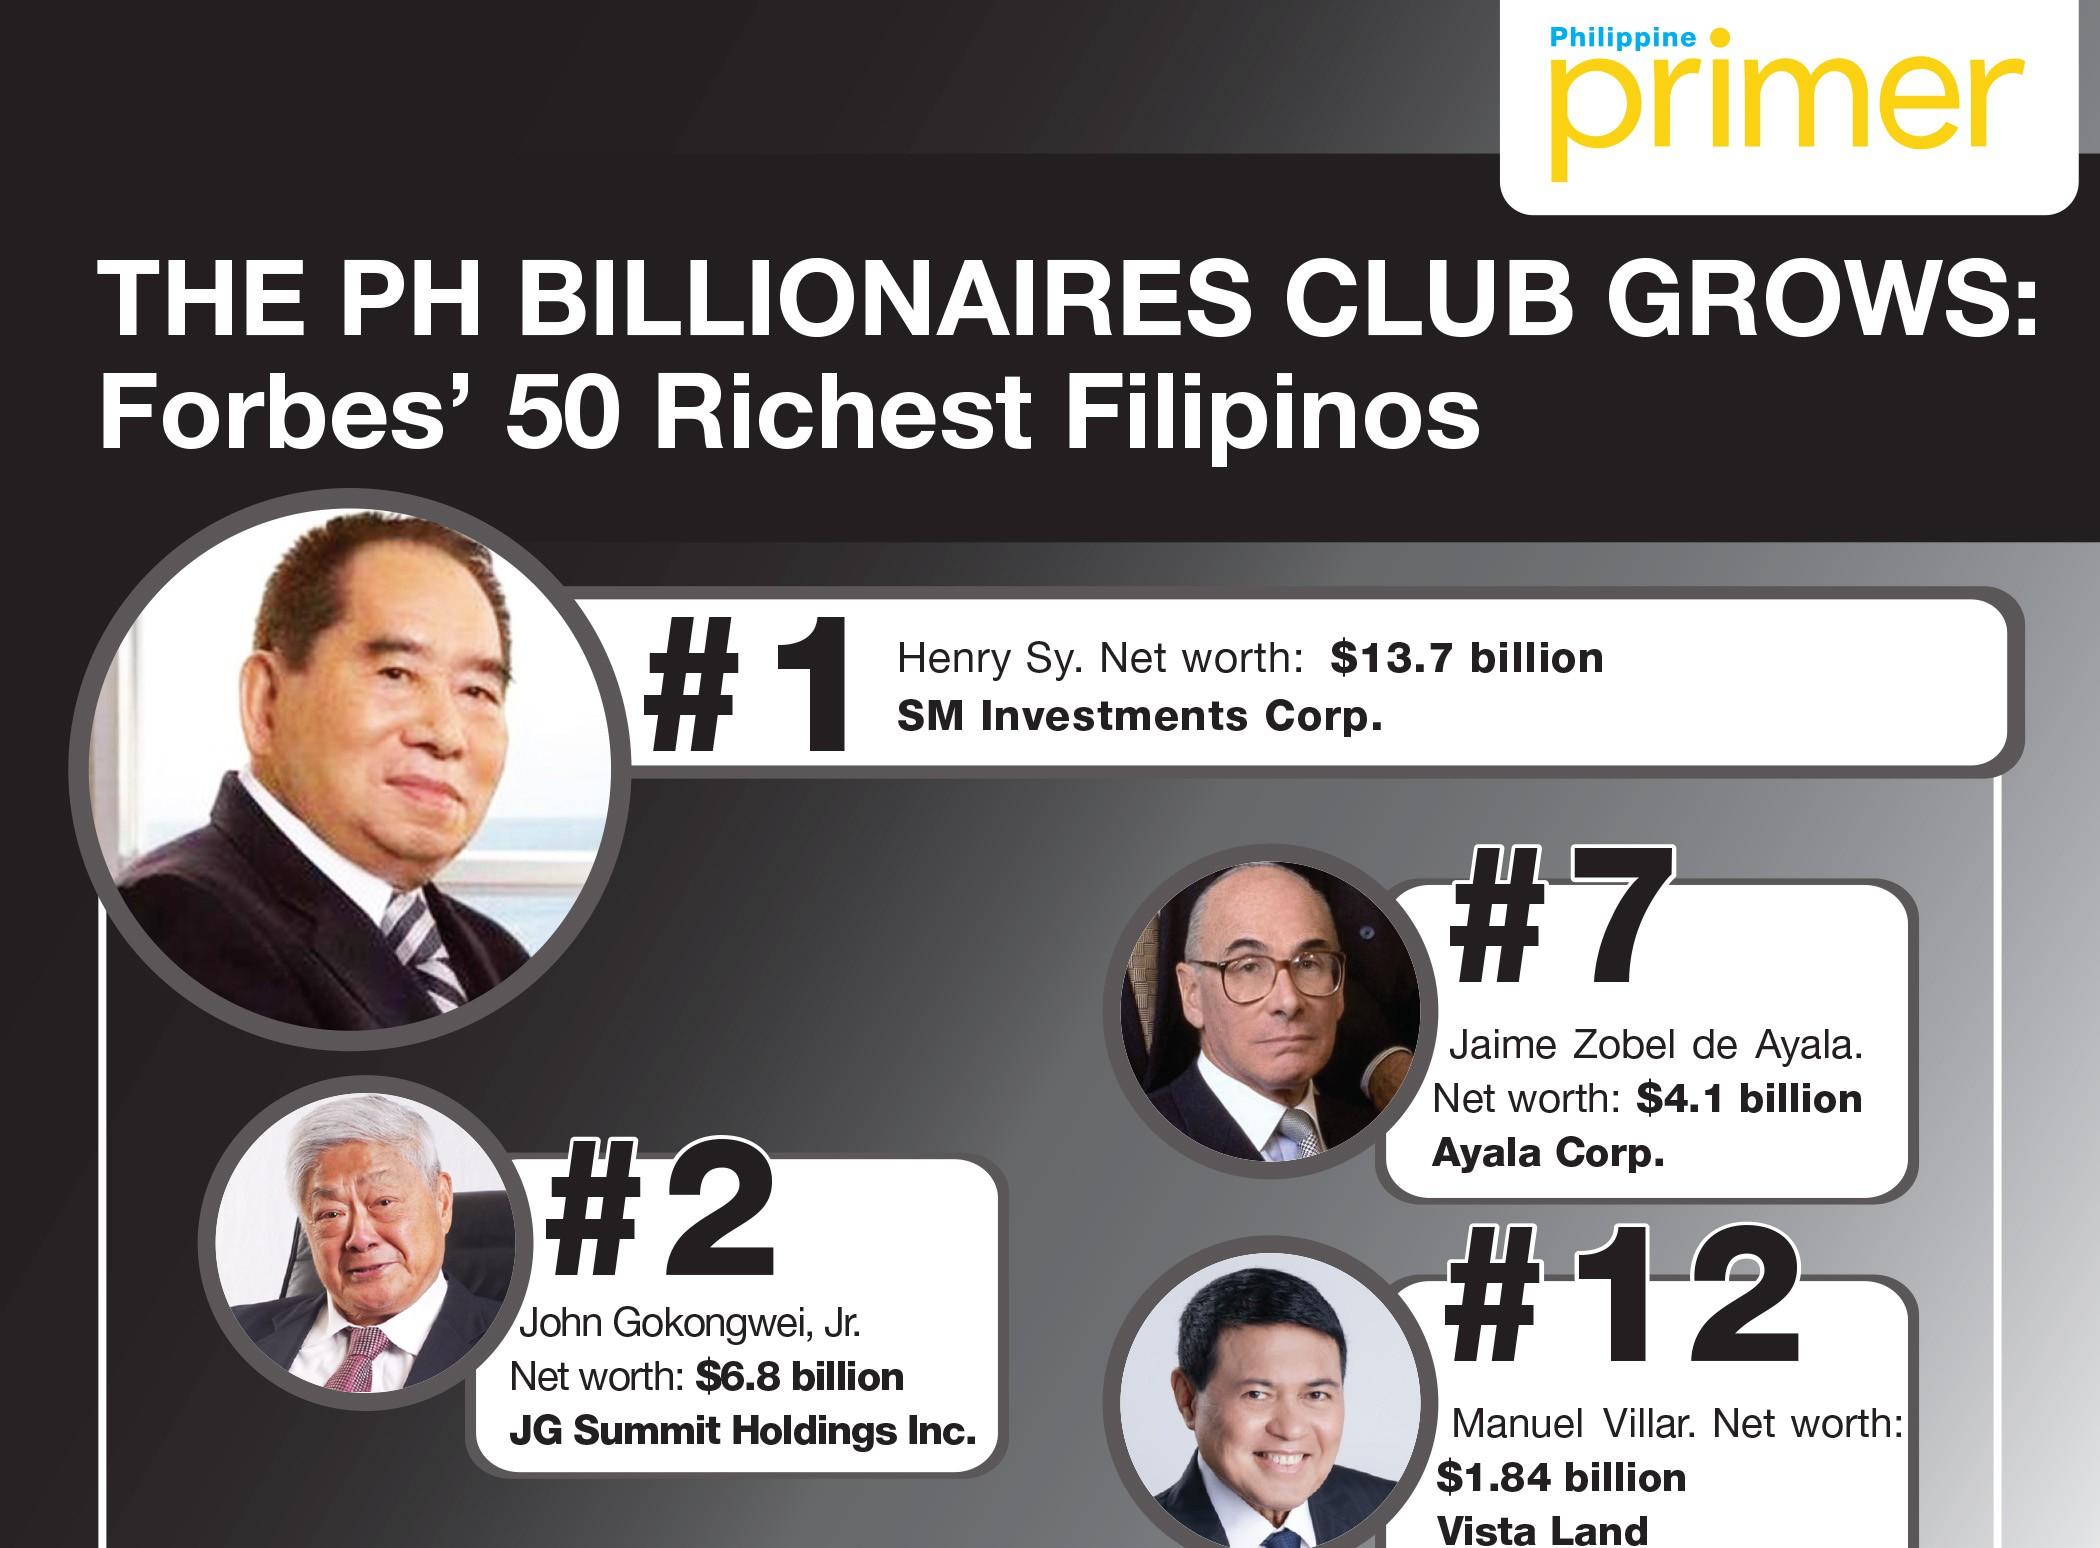 the ph billionaires club grows  forbes u2019 50 richest